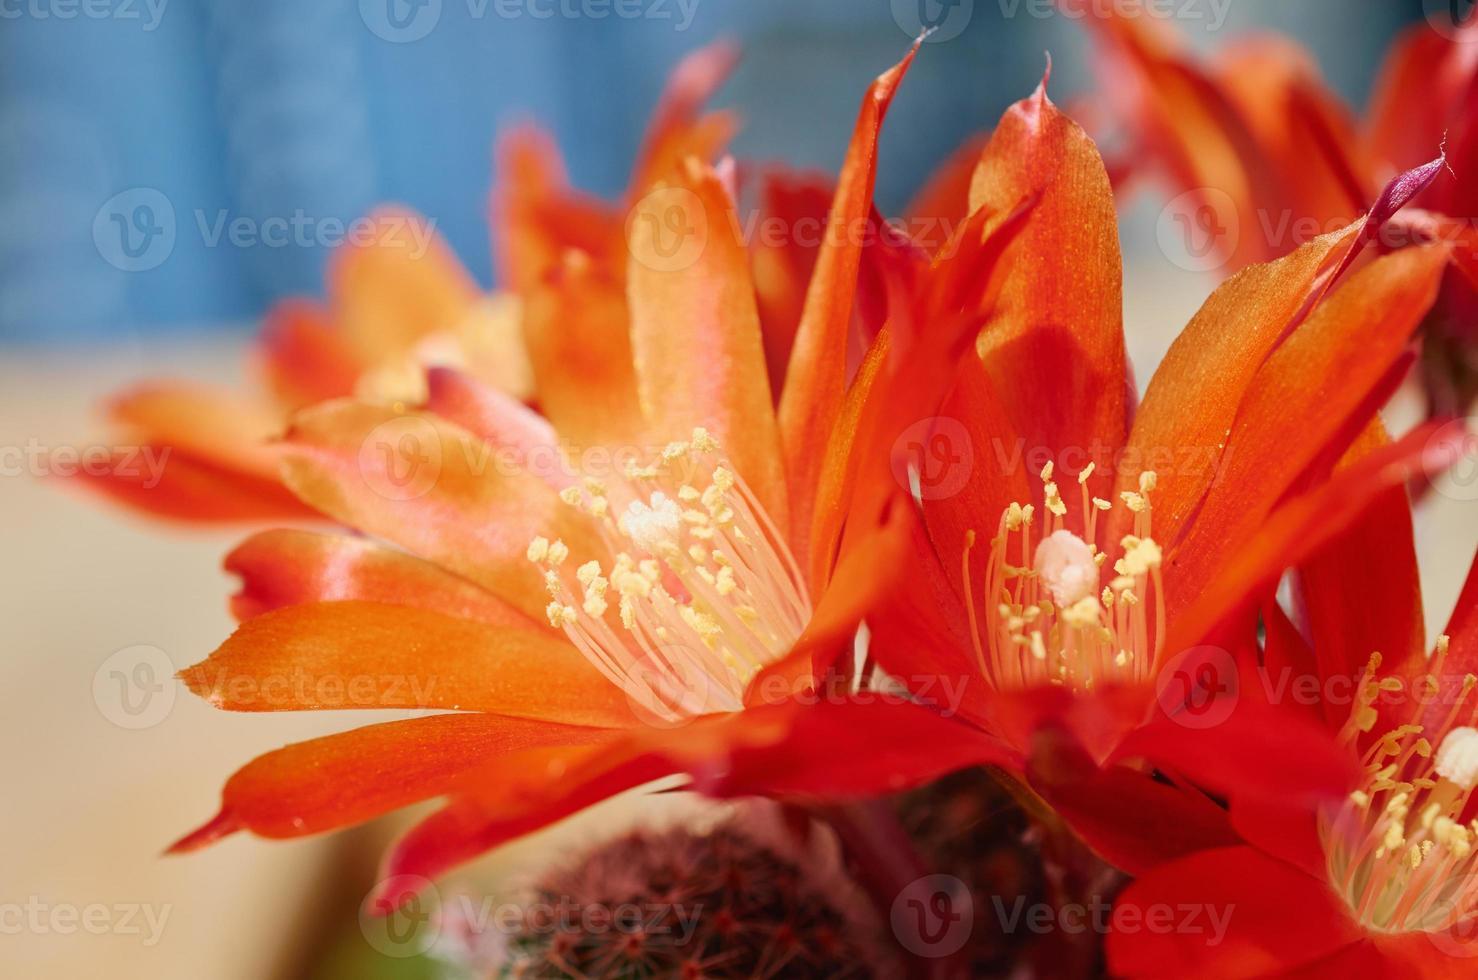 bloem cactus rebutia heliosa macro op natuur achtergrond foto